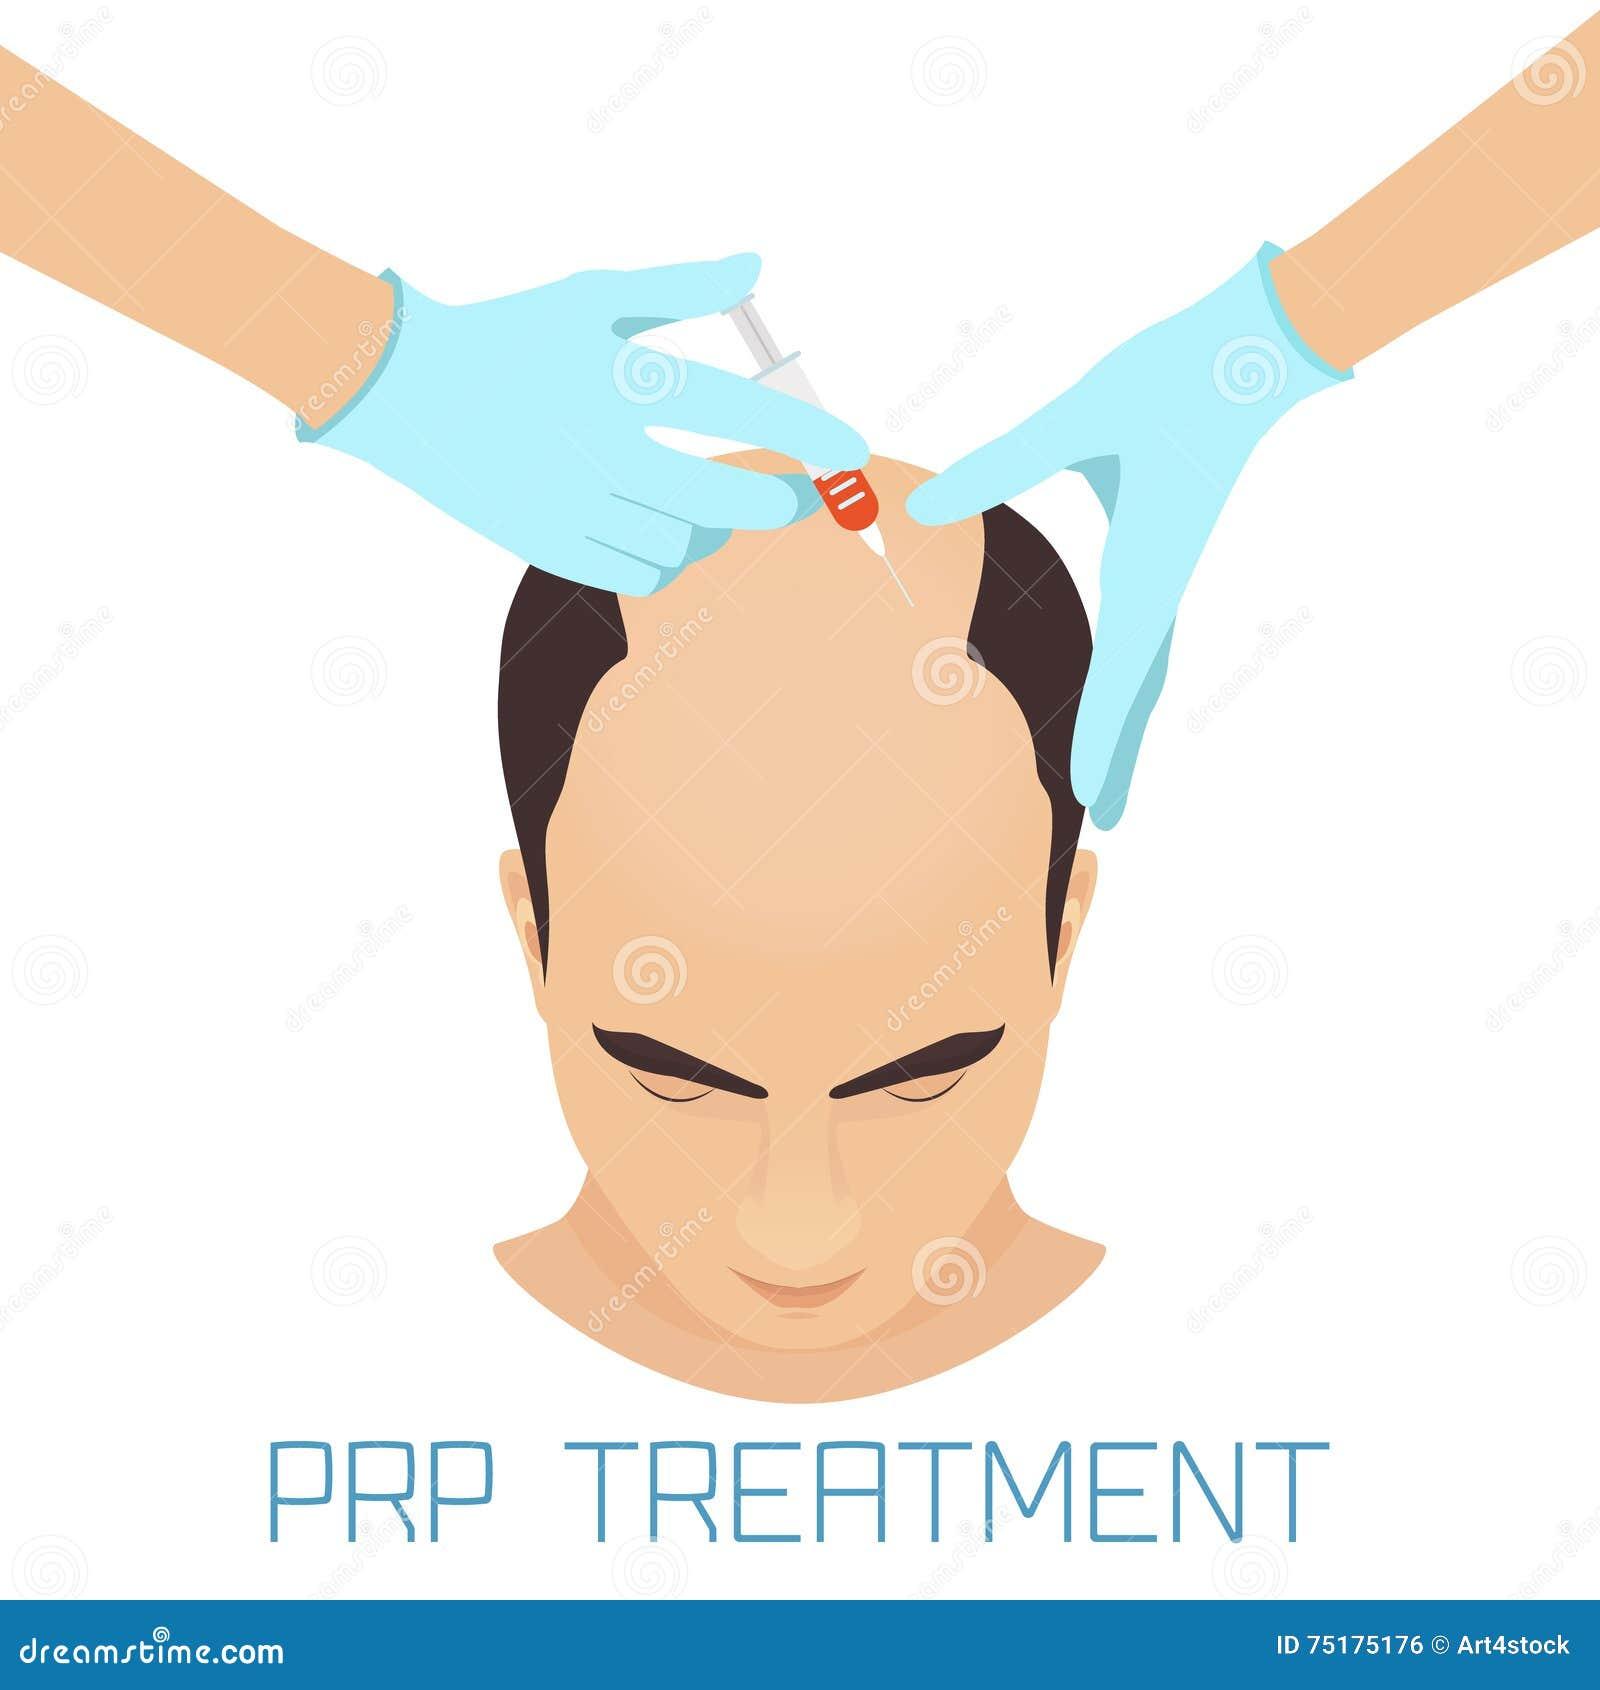 Prp Treatment For Men Stock Vector Image 75175176